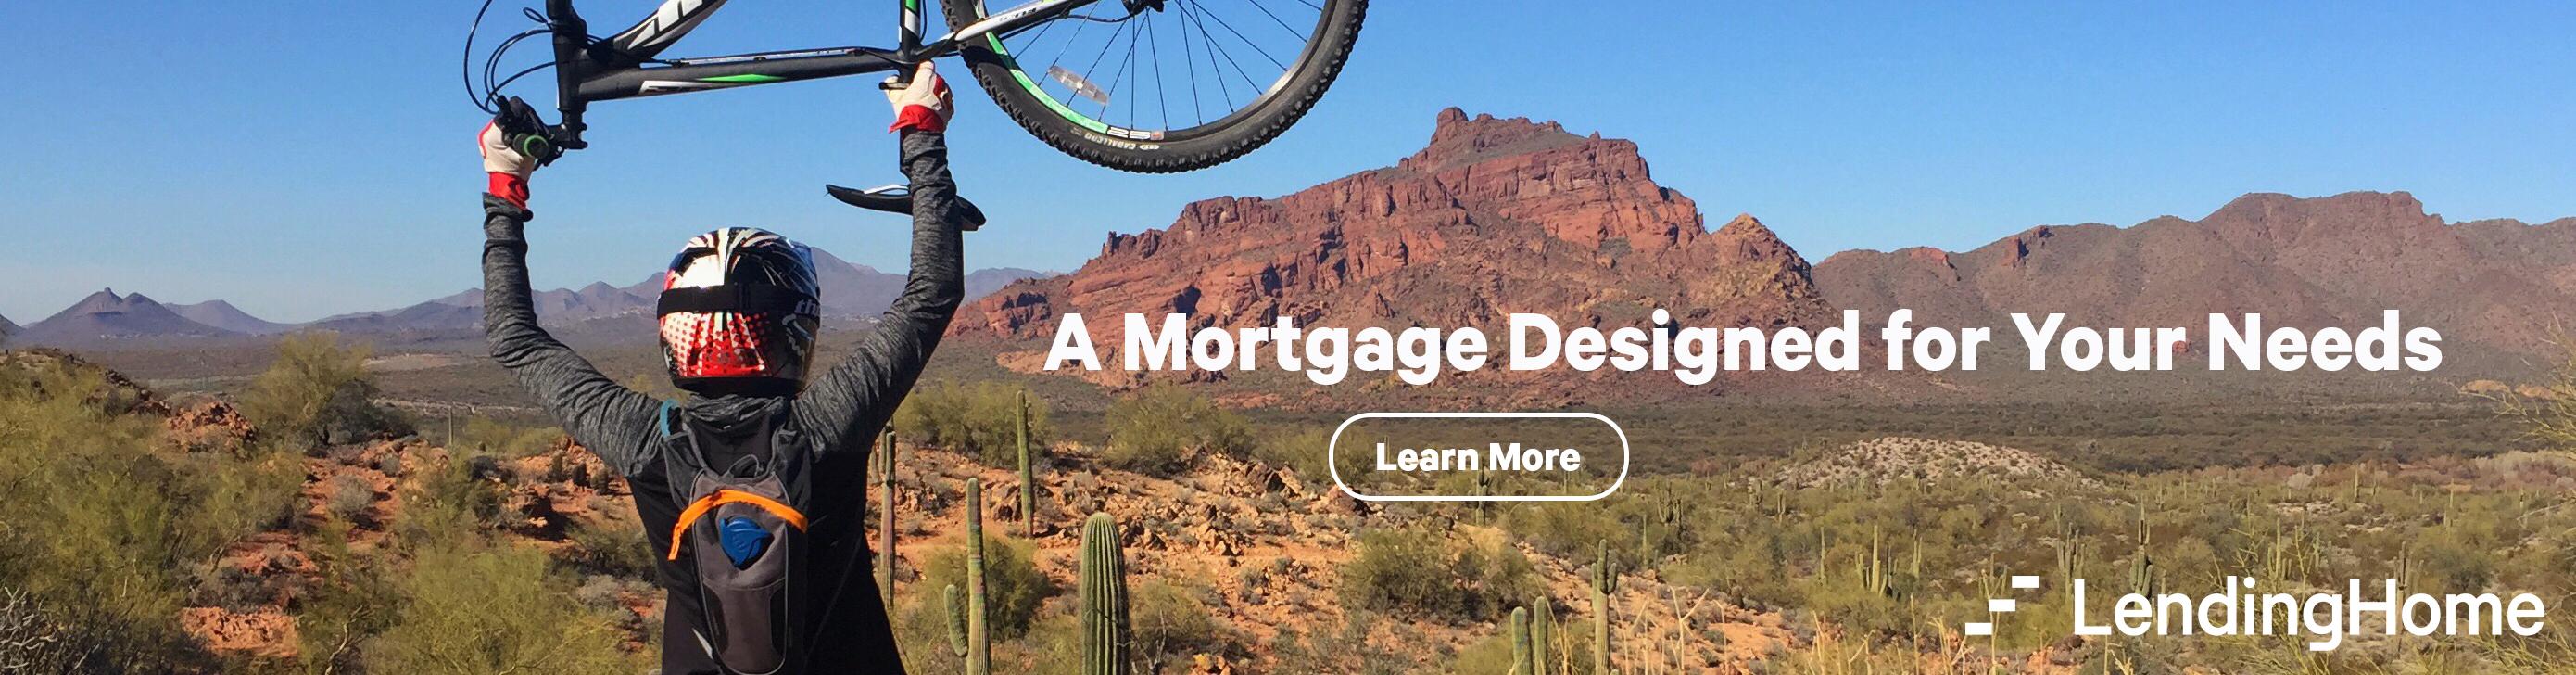 A man in a helmet raising his bike up to a desert landscape.